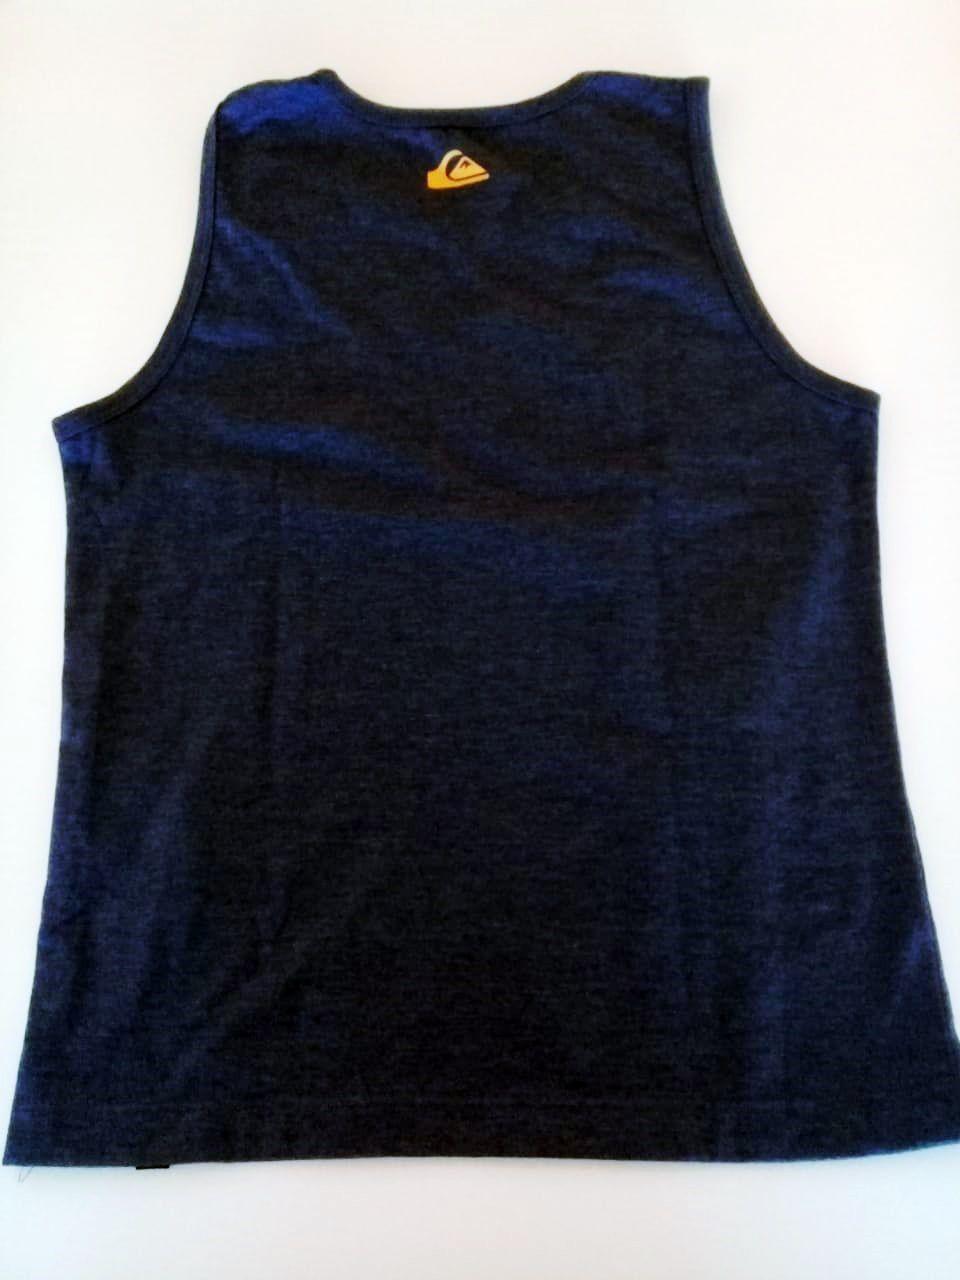 Camiseta Regata Quiksilver Vice Versa Infantil